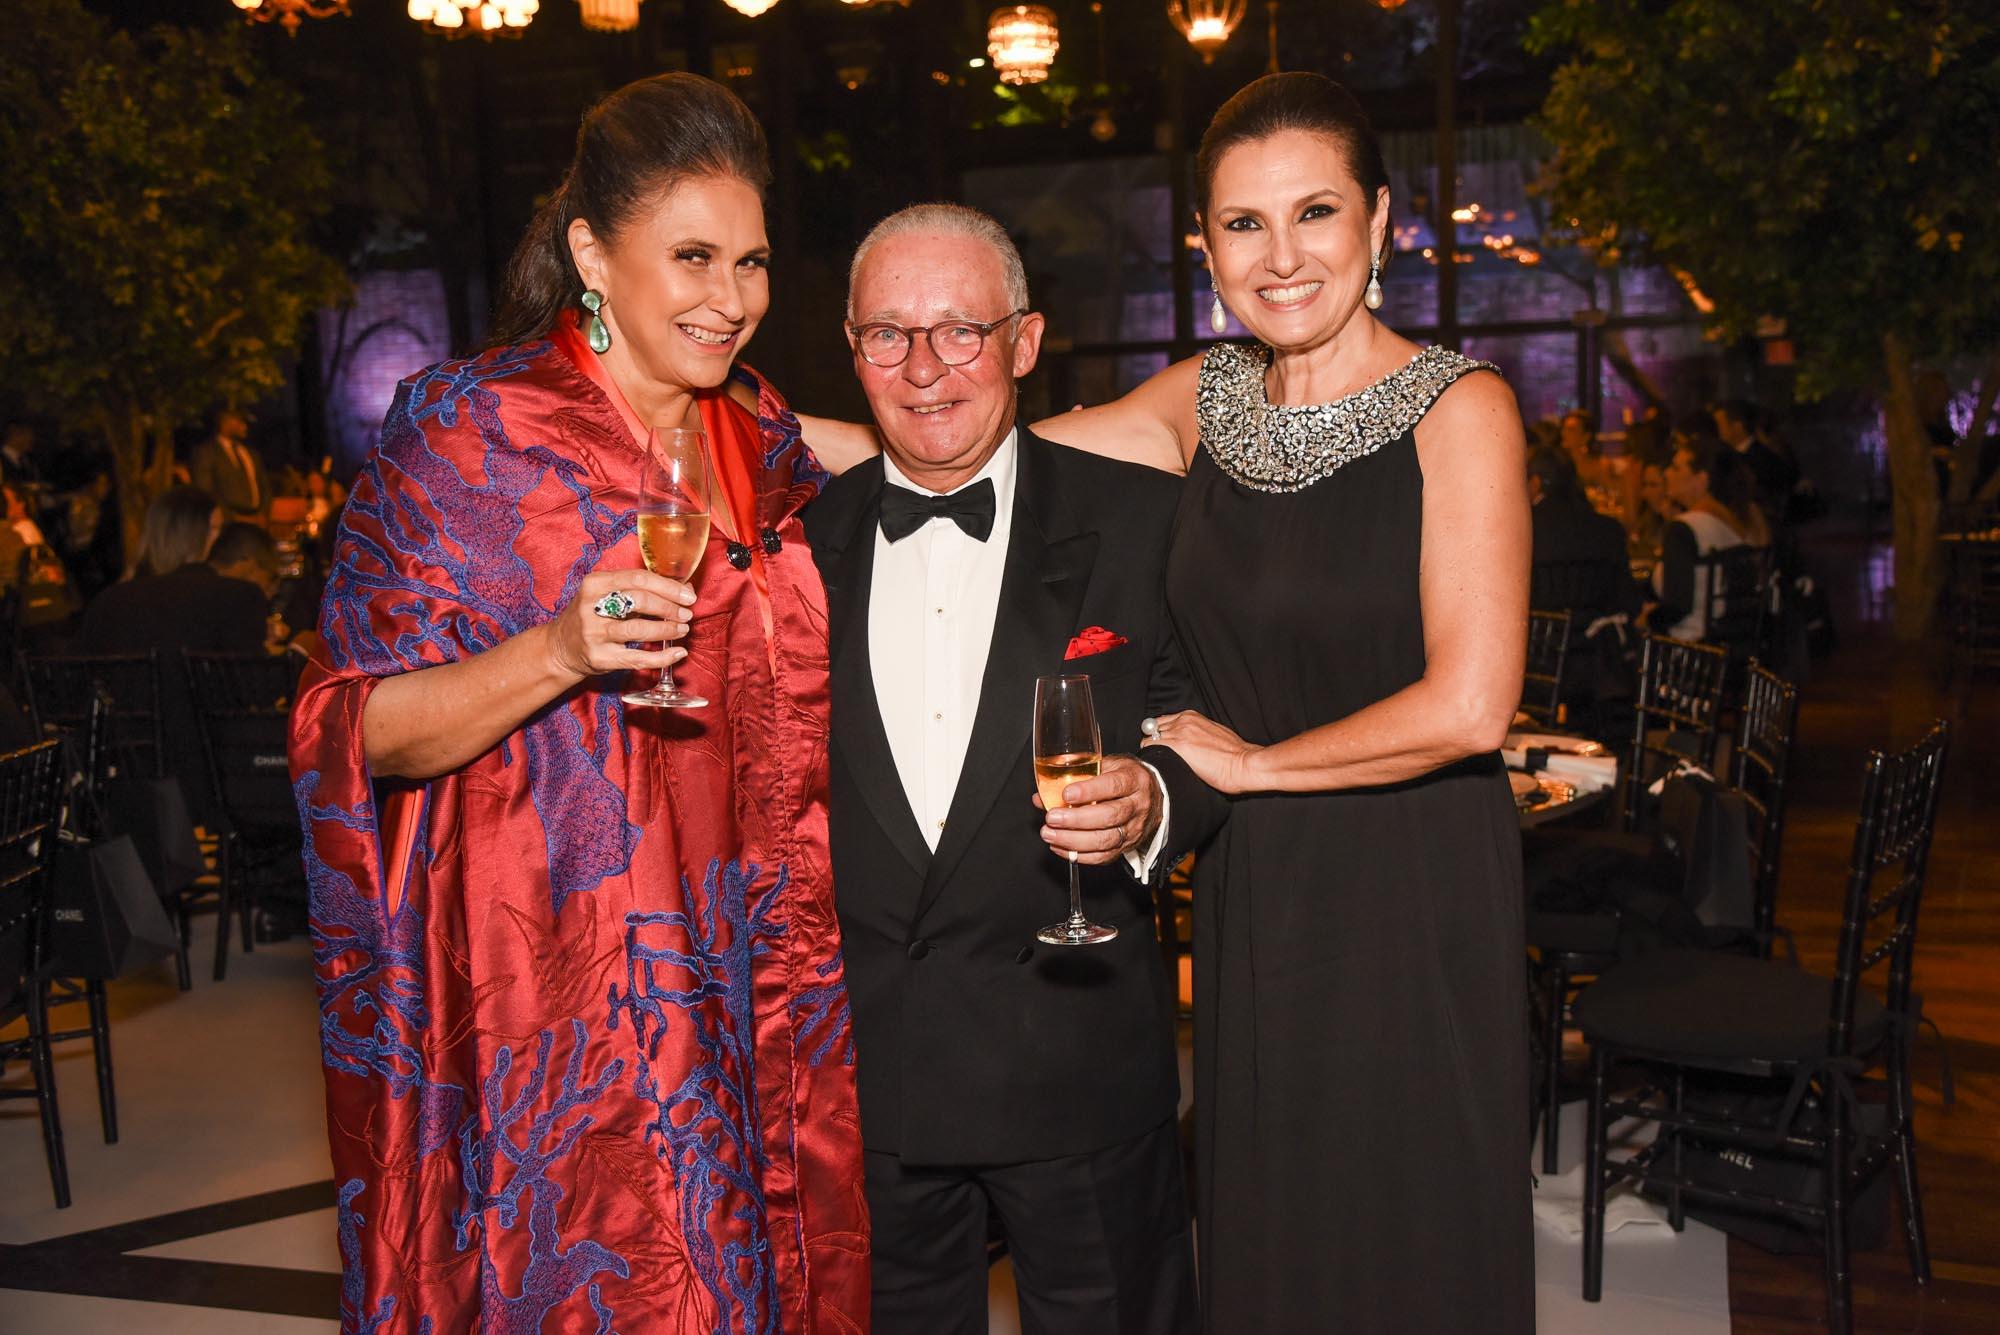 Fafa de Belem, Philippe de Nicolay Rothschild e Cris Lotaif V BrazilFoundation Gala São Paulo Chanel 2018 Filantropia Brasil Philanthropy Brazil